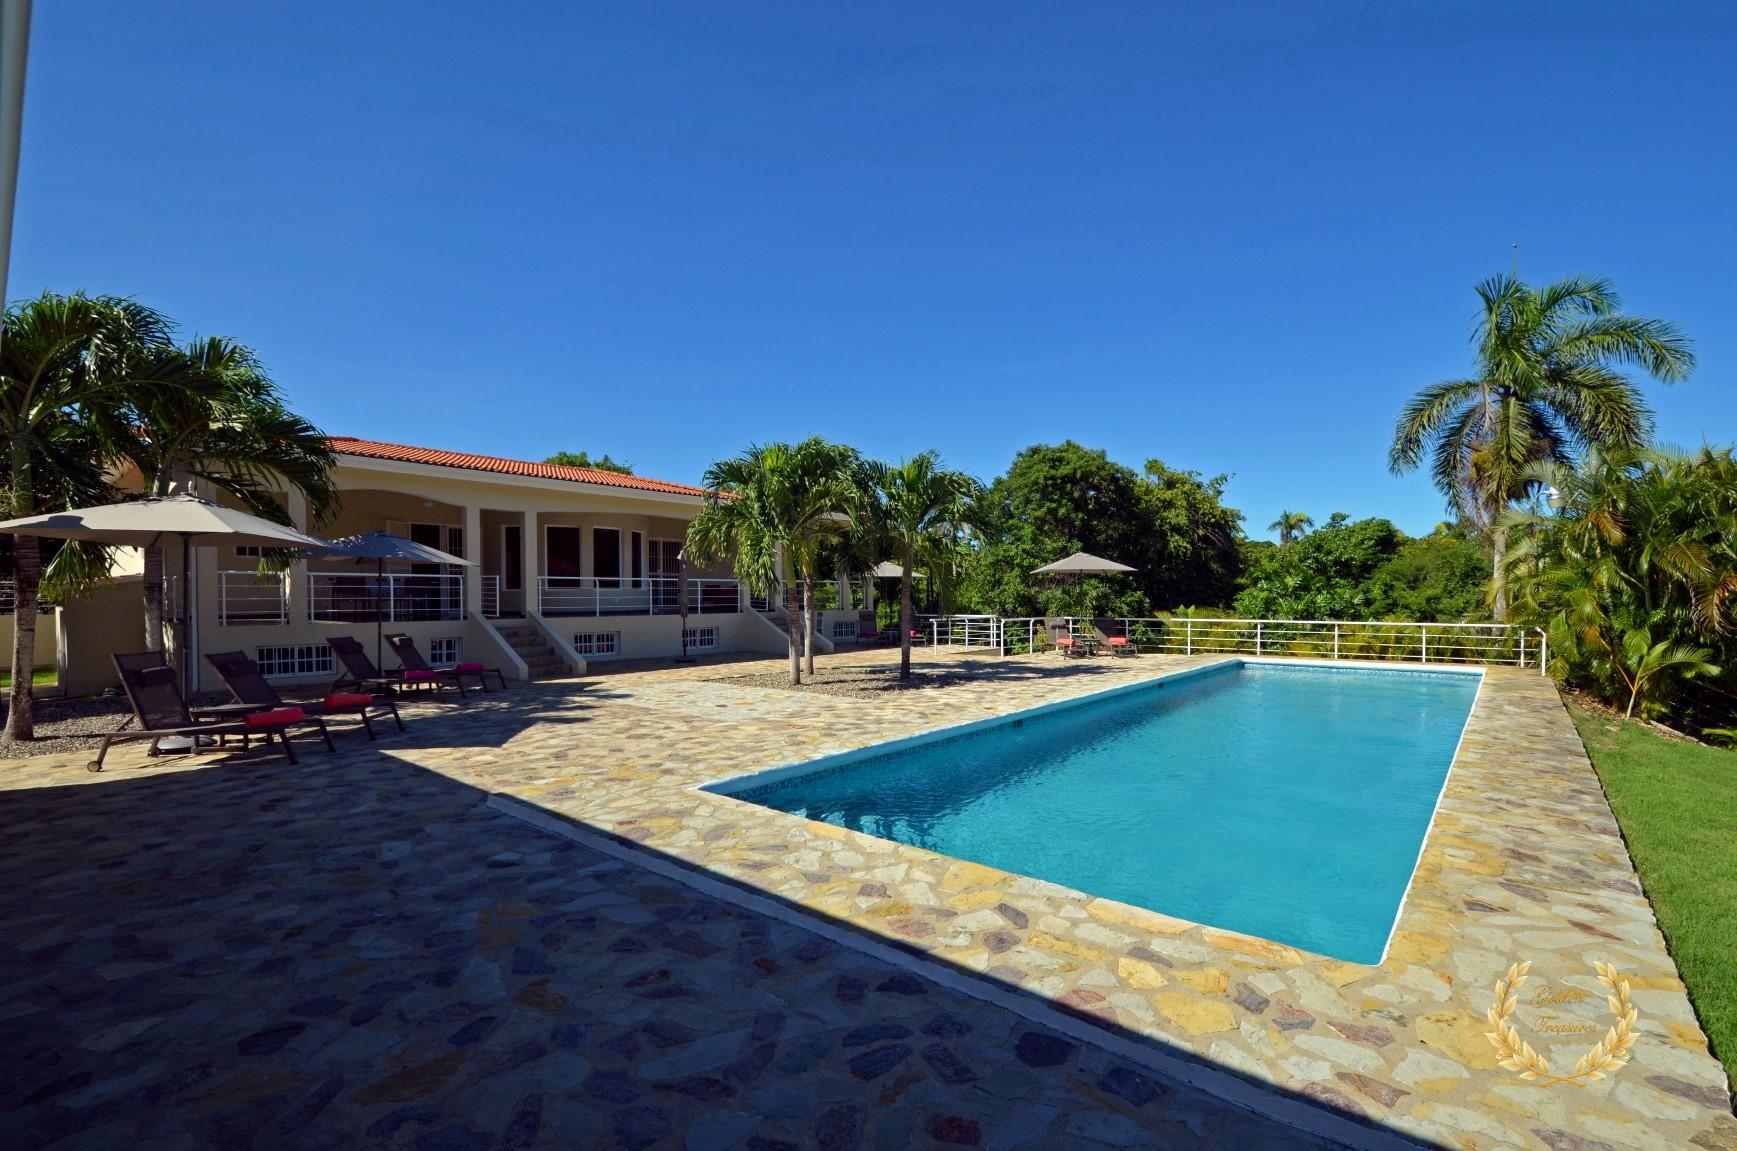 6 Bedroom Villa for Sale in Sosua, DR